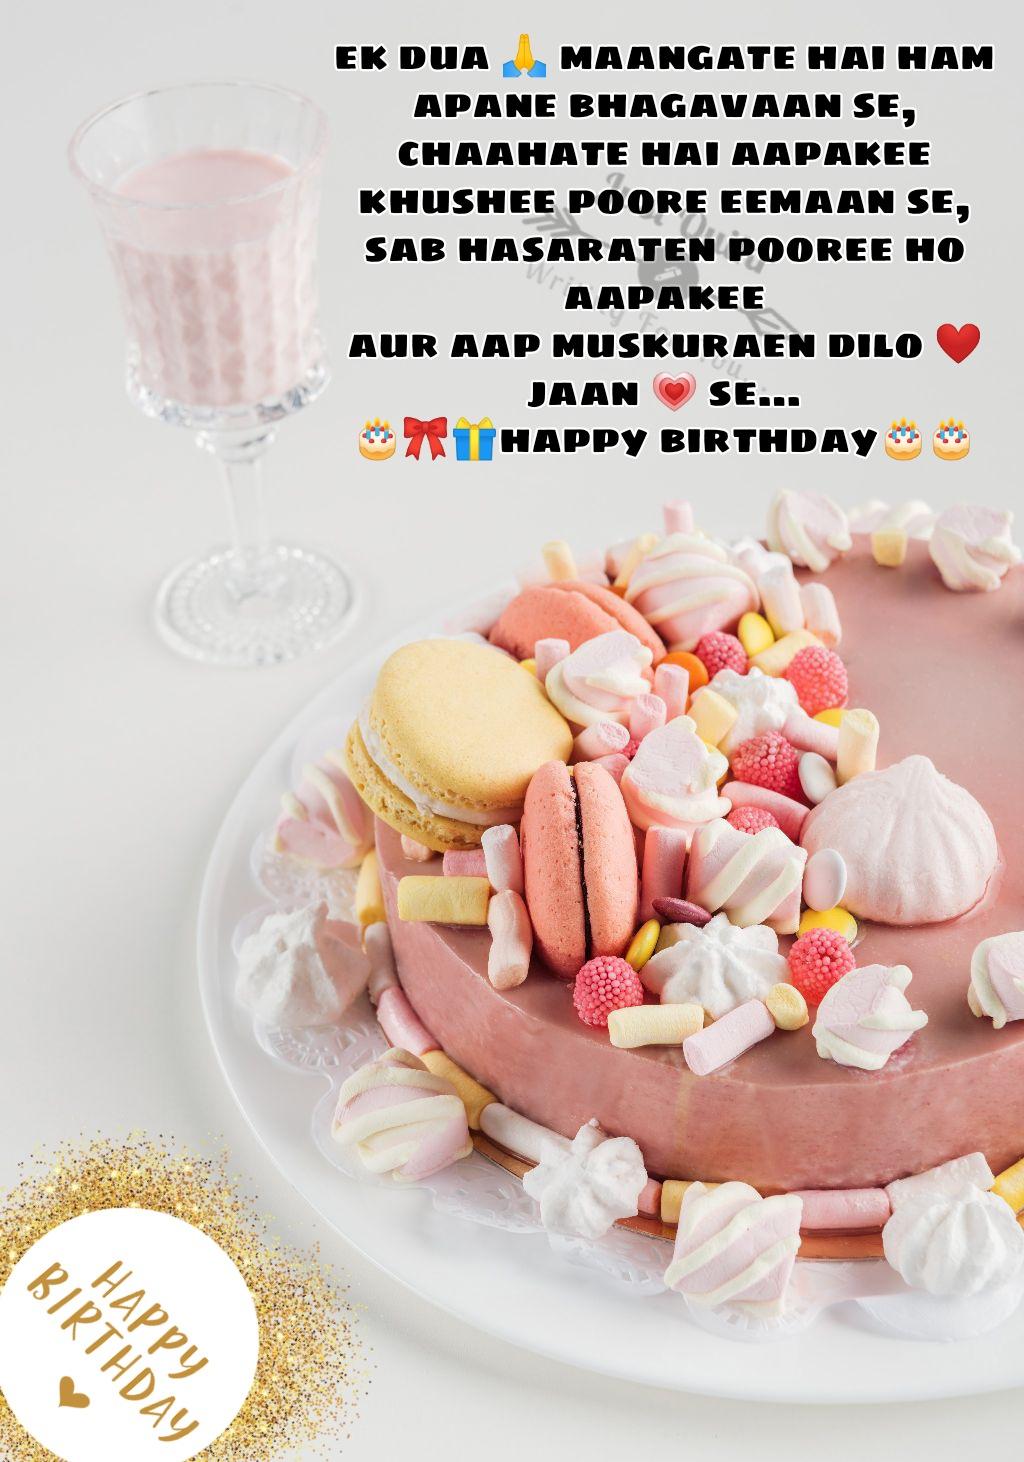 Happy Birthday Cake HD Pics Images with Shayari Sayings for Aunty